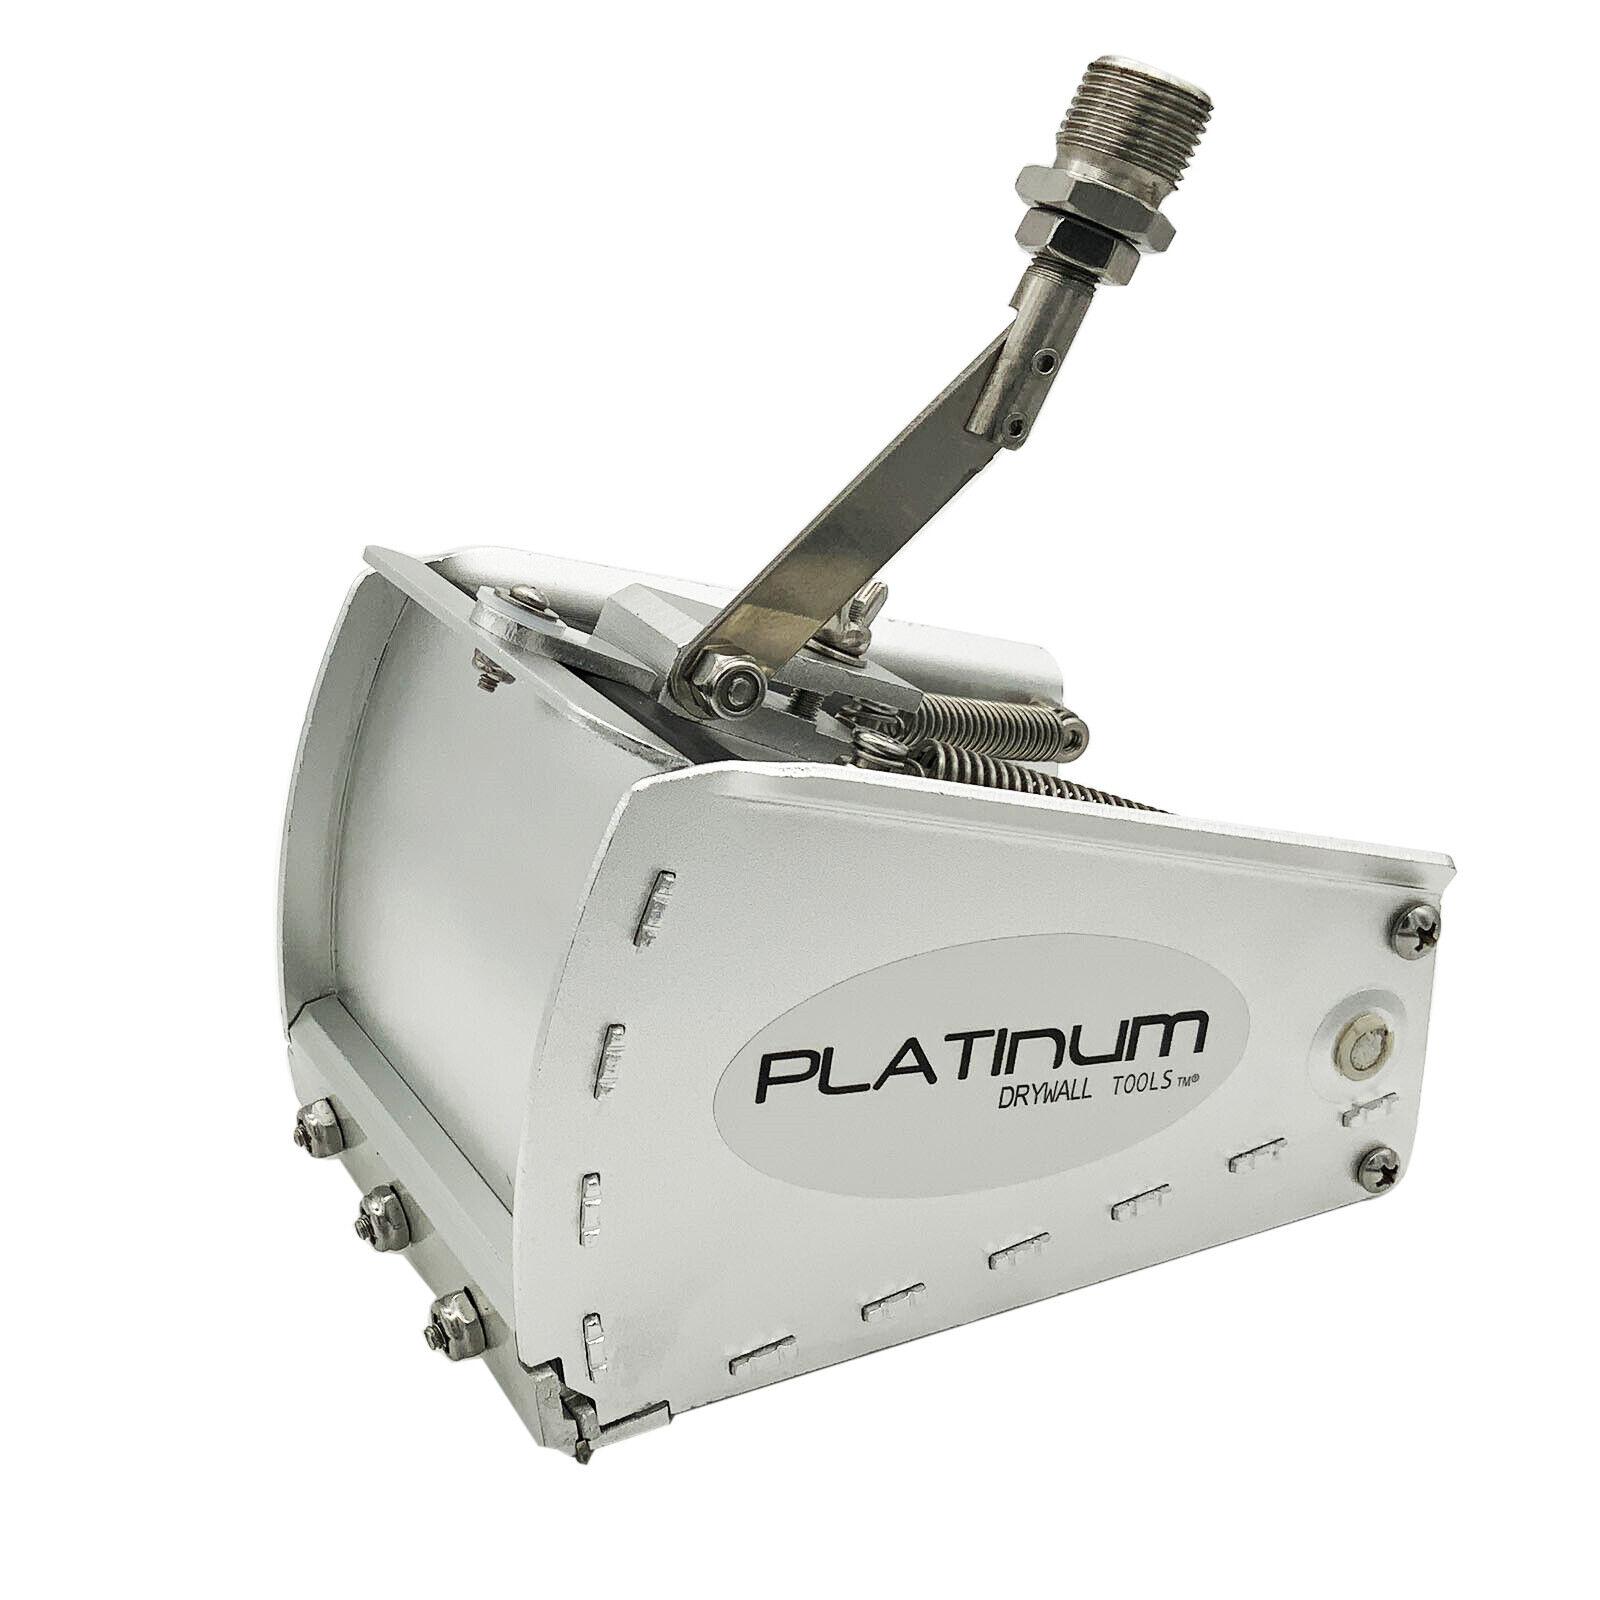 "Platinum Drywall Tools 3"" Nail / Screw Spotter"